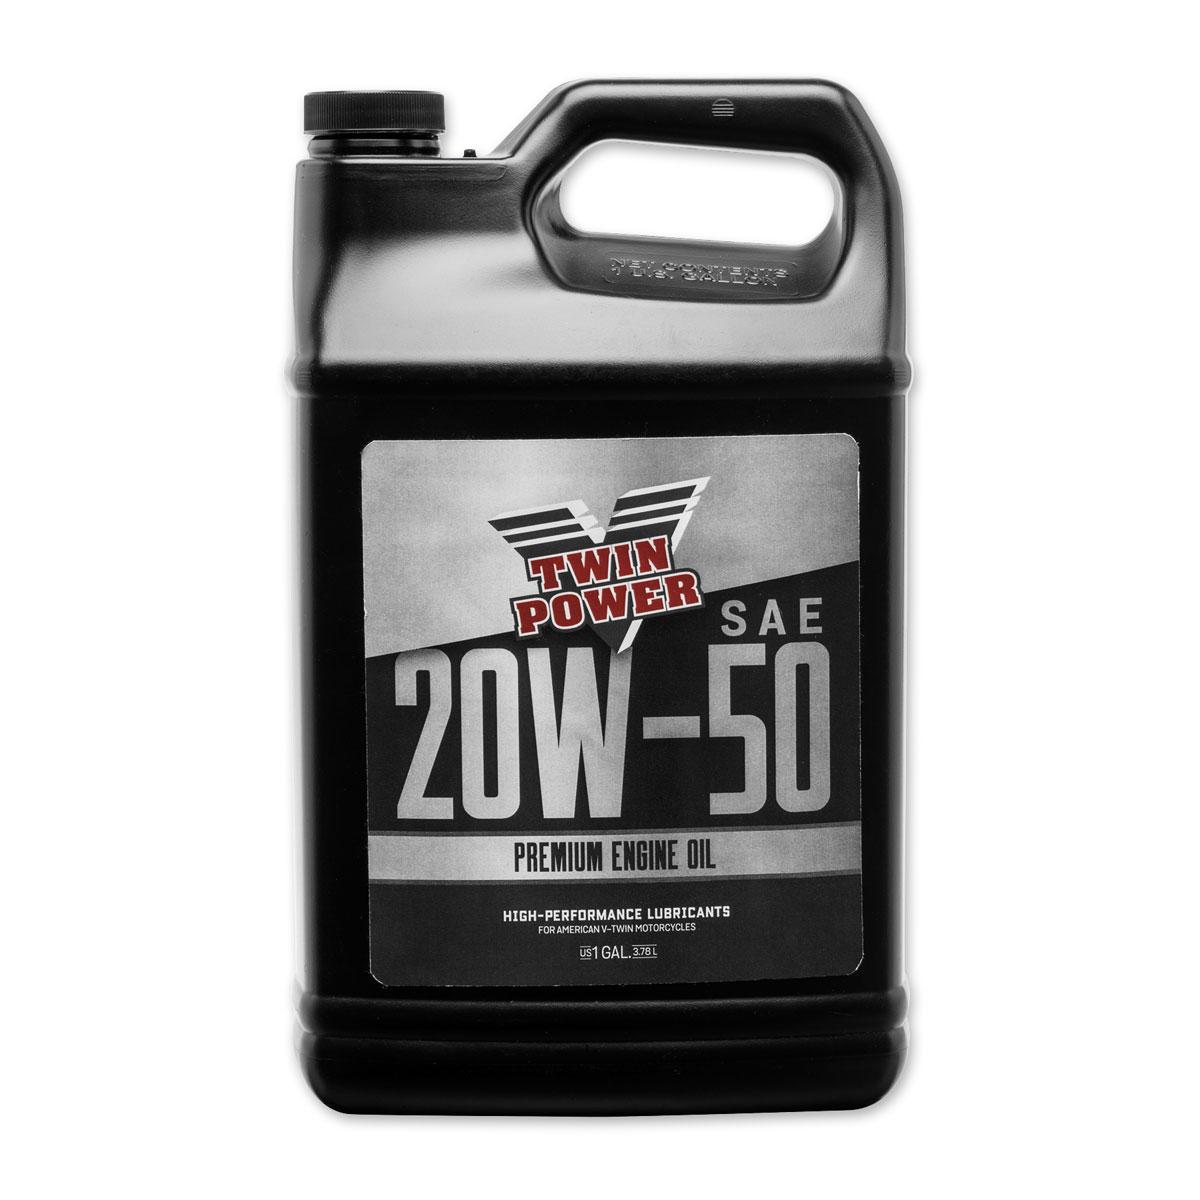 Twin Power Premium 20W50 Engine Oil Gallon